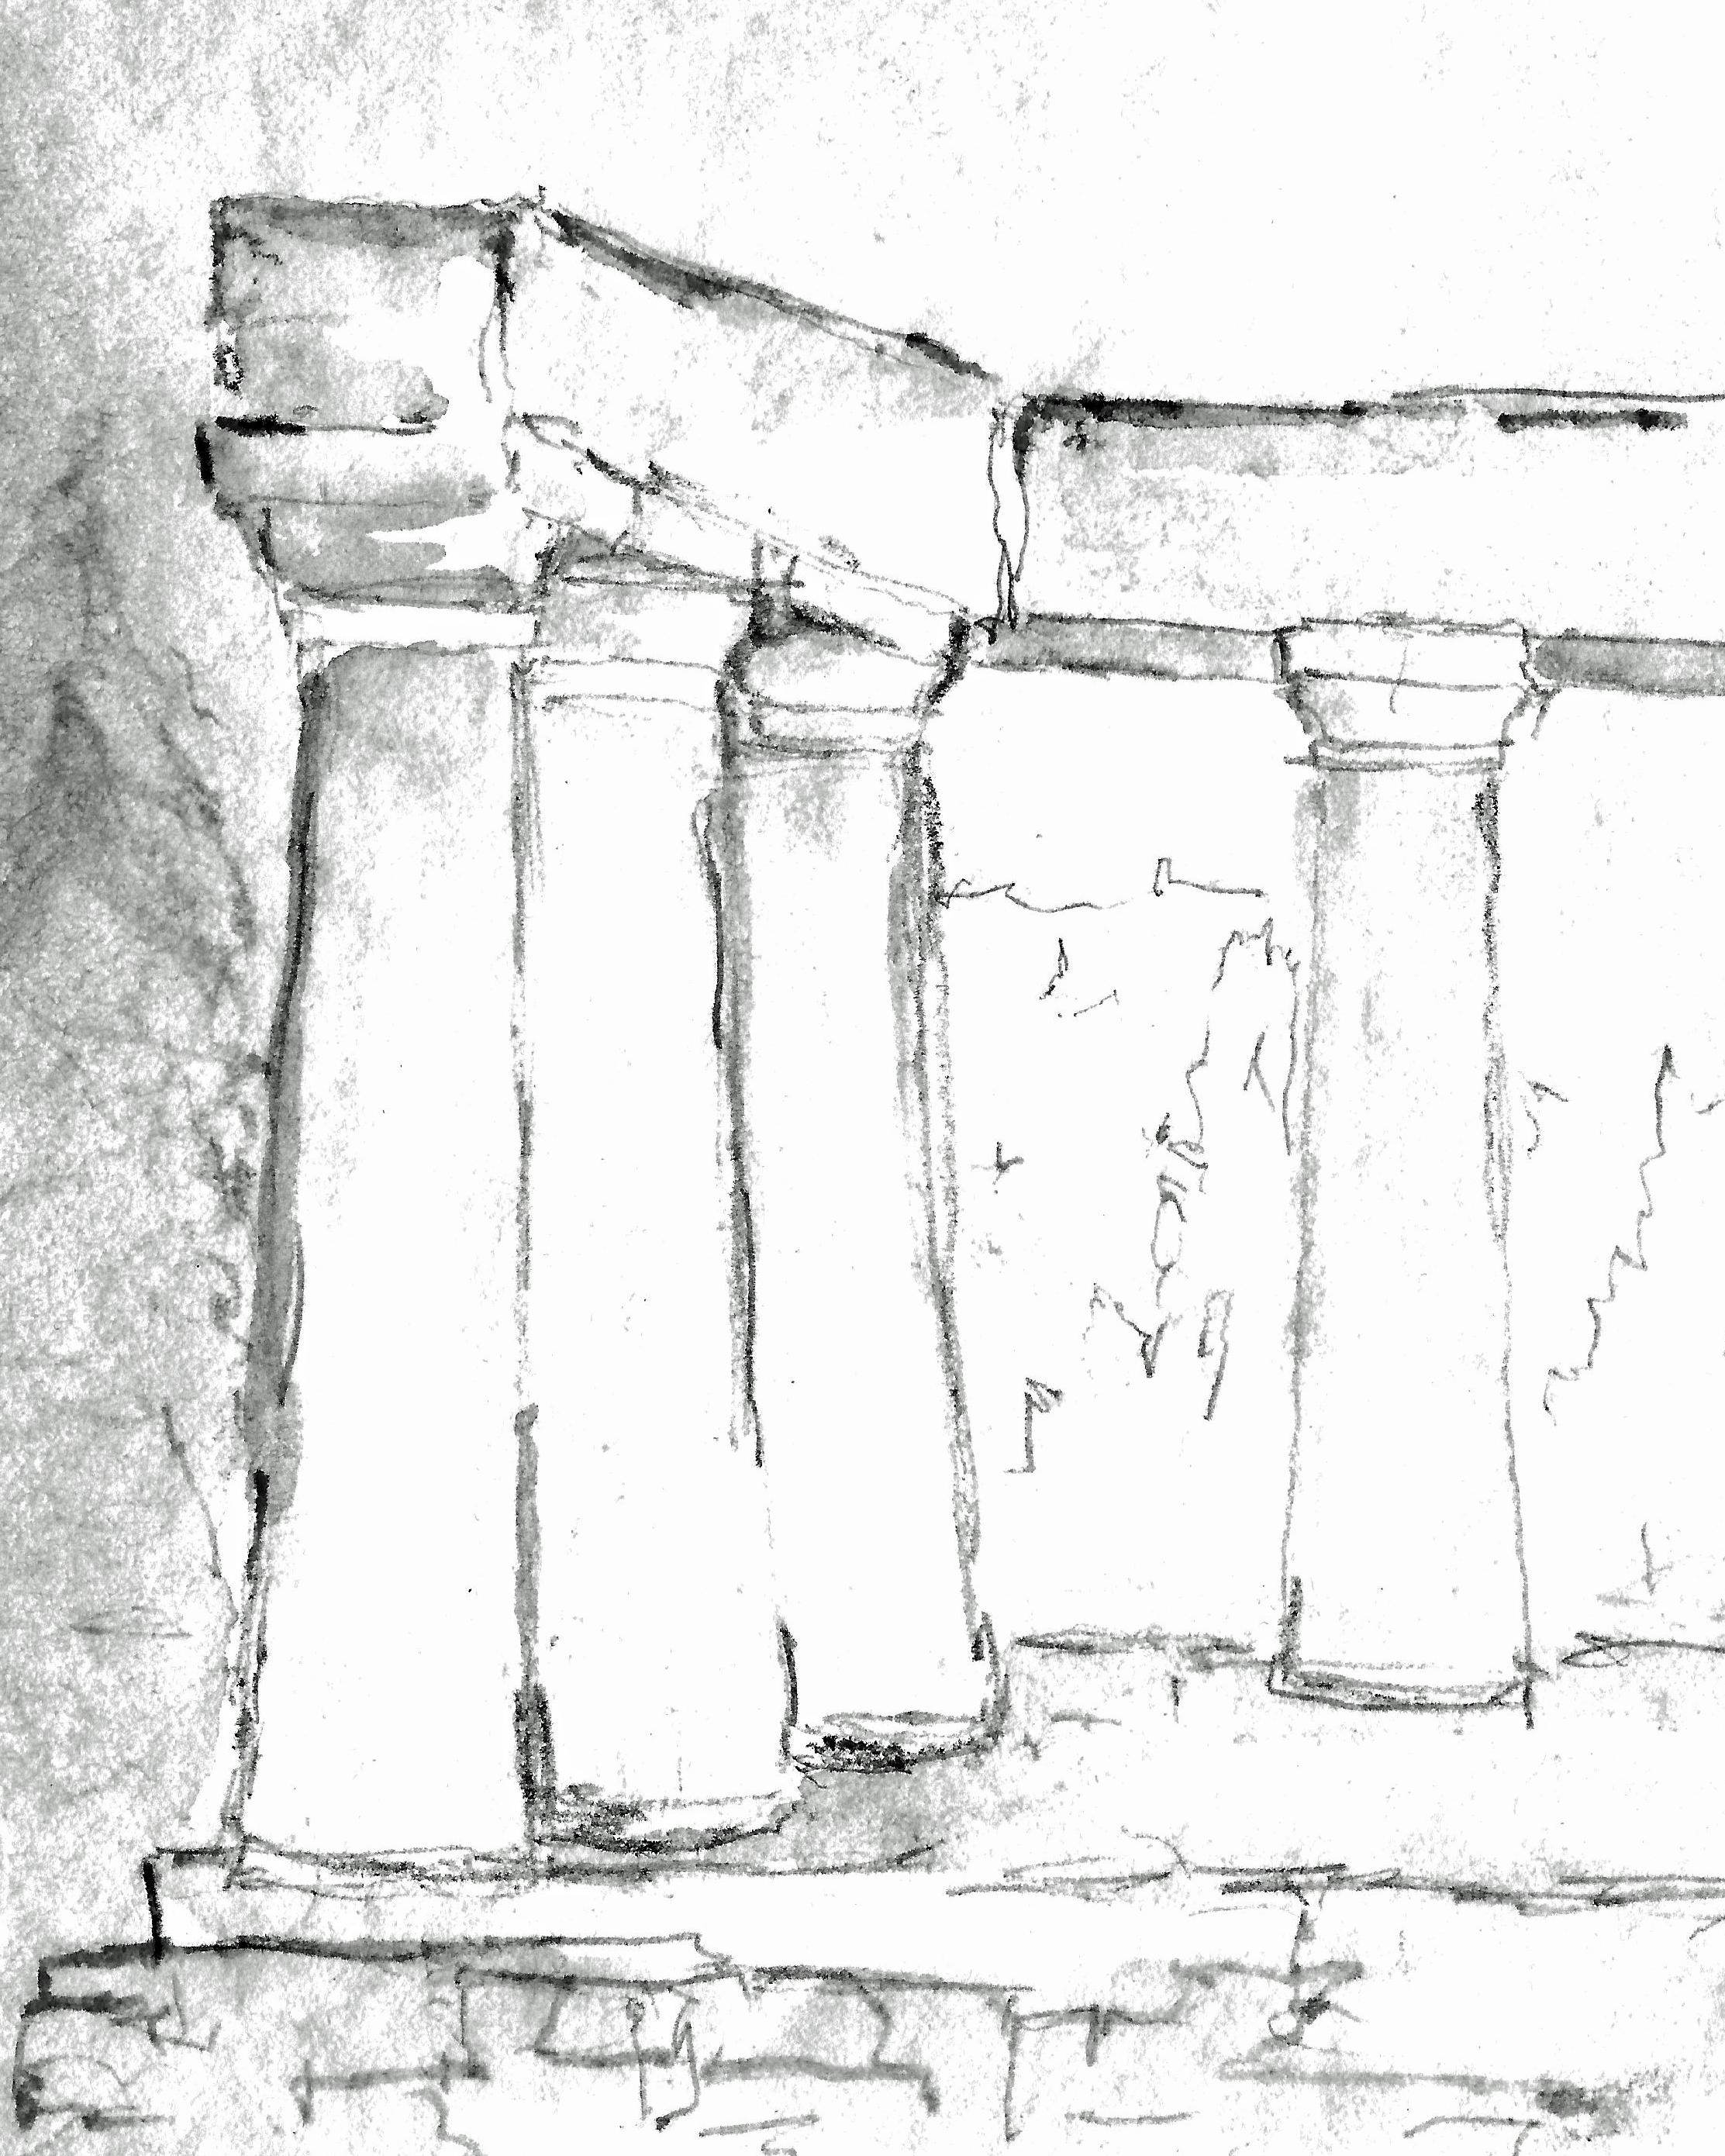 JenJonesArchitecture_travel-sketch-greece-1-cropped.jpg